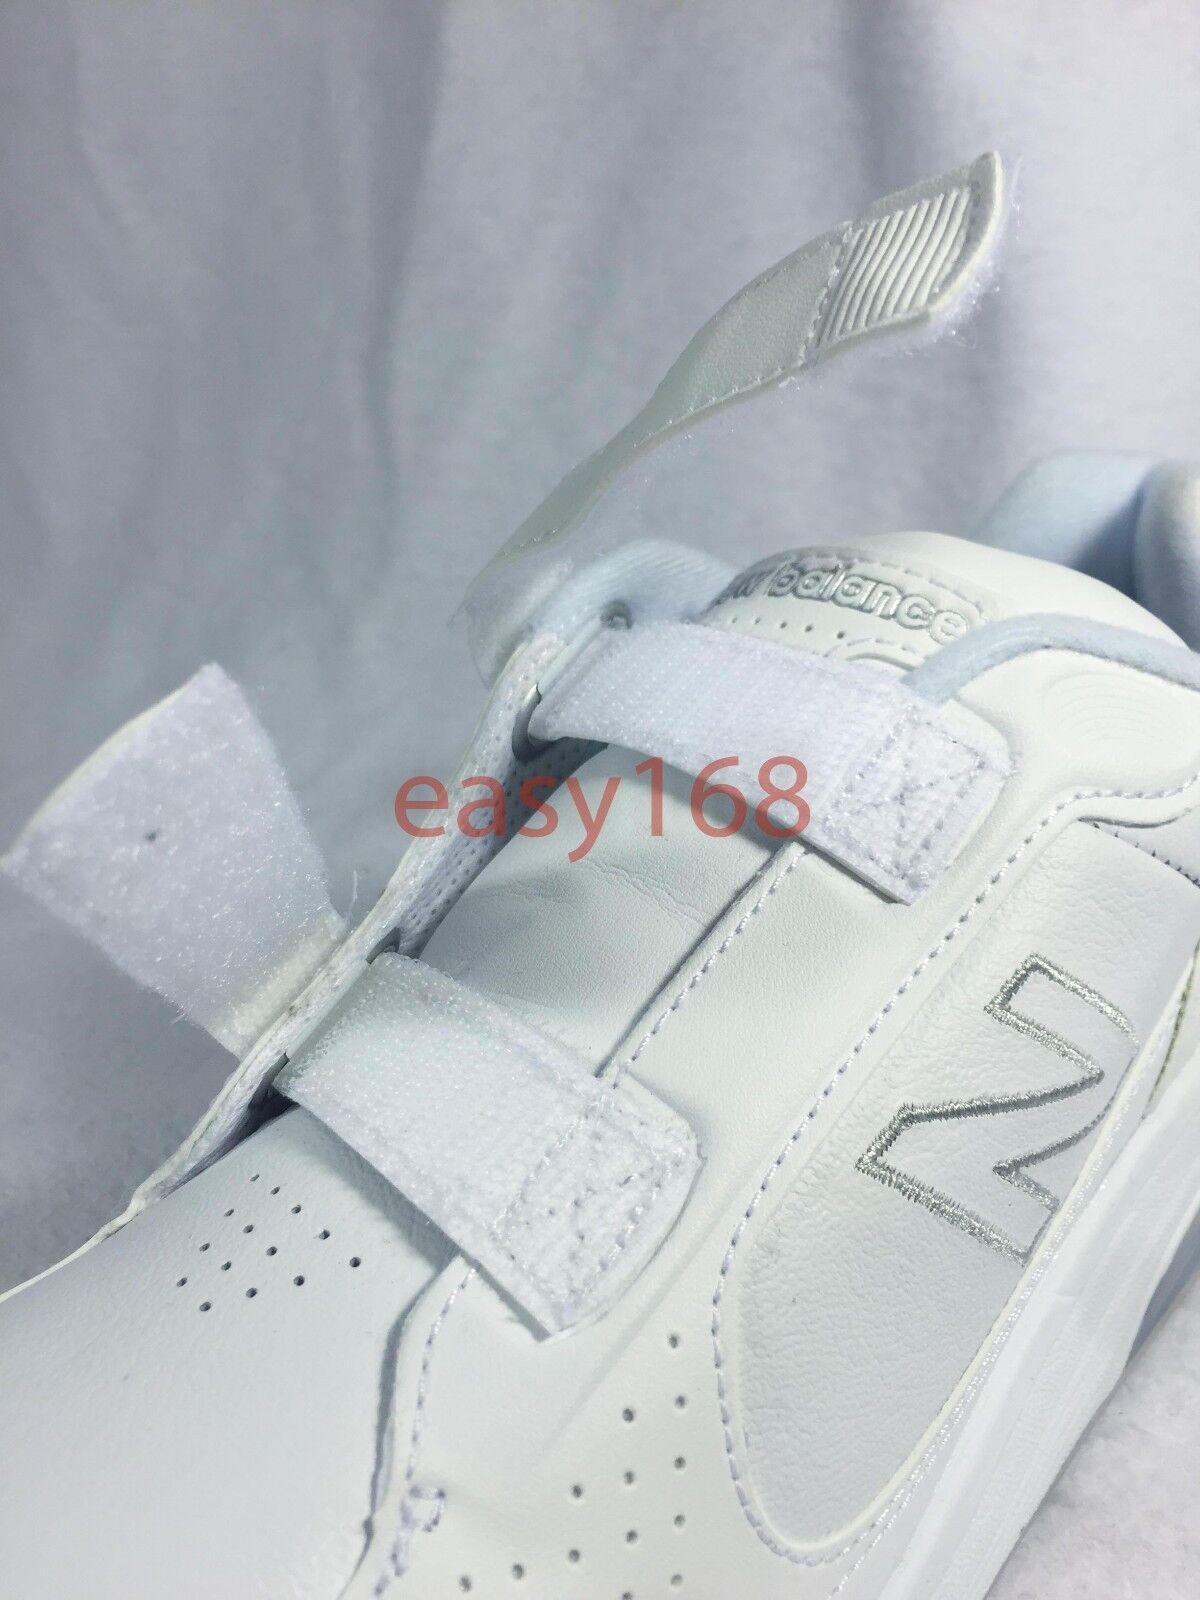 New New Balance 928 Sz 10.5 WMNS Walking Schuhes WW928VW WW928VW Schuhes Weiß 42.5 2A Hook loop 70080d